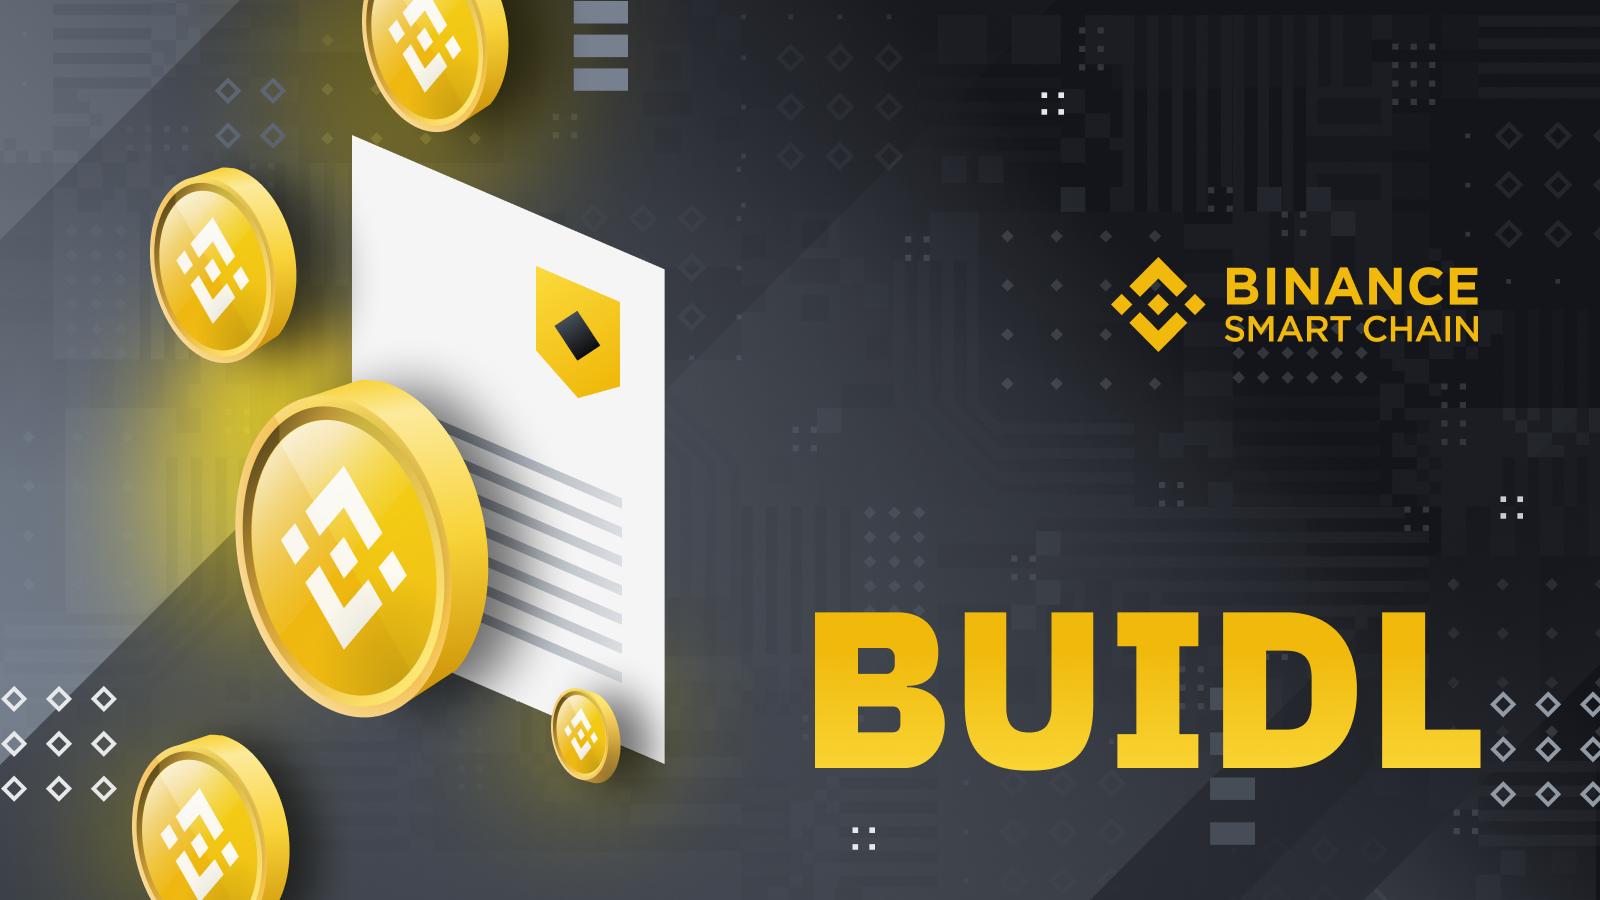 BUIDL Reward Program Updates with $3.248 Million Dollar Distributed as February Reward